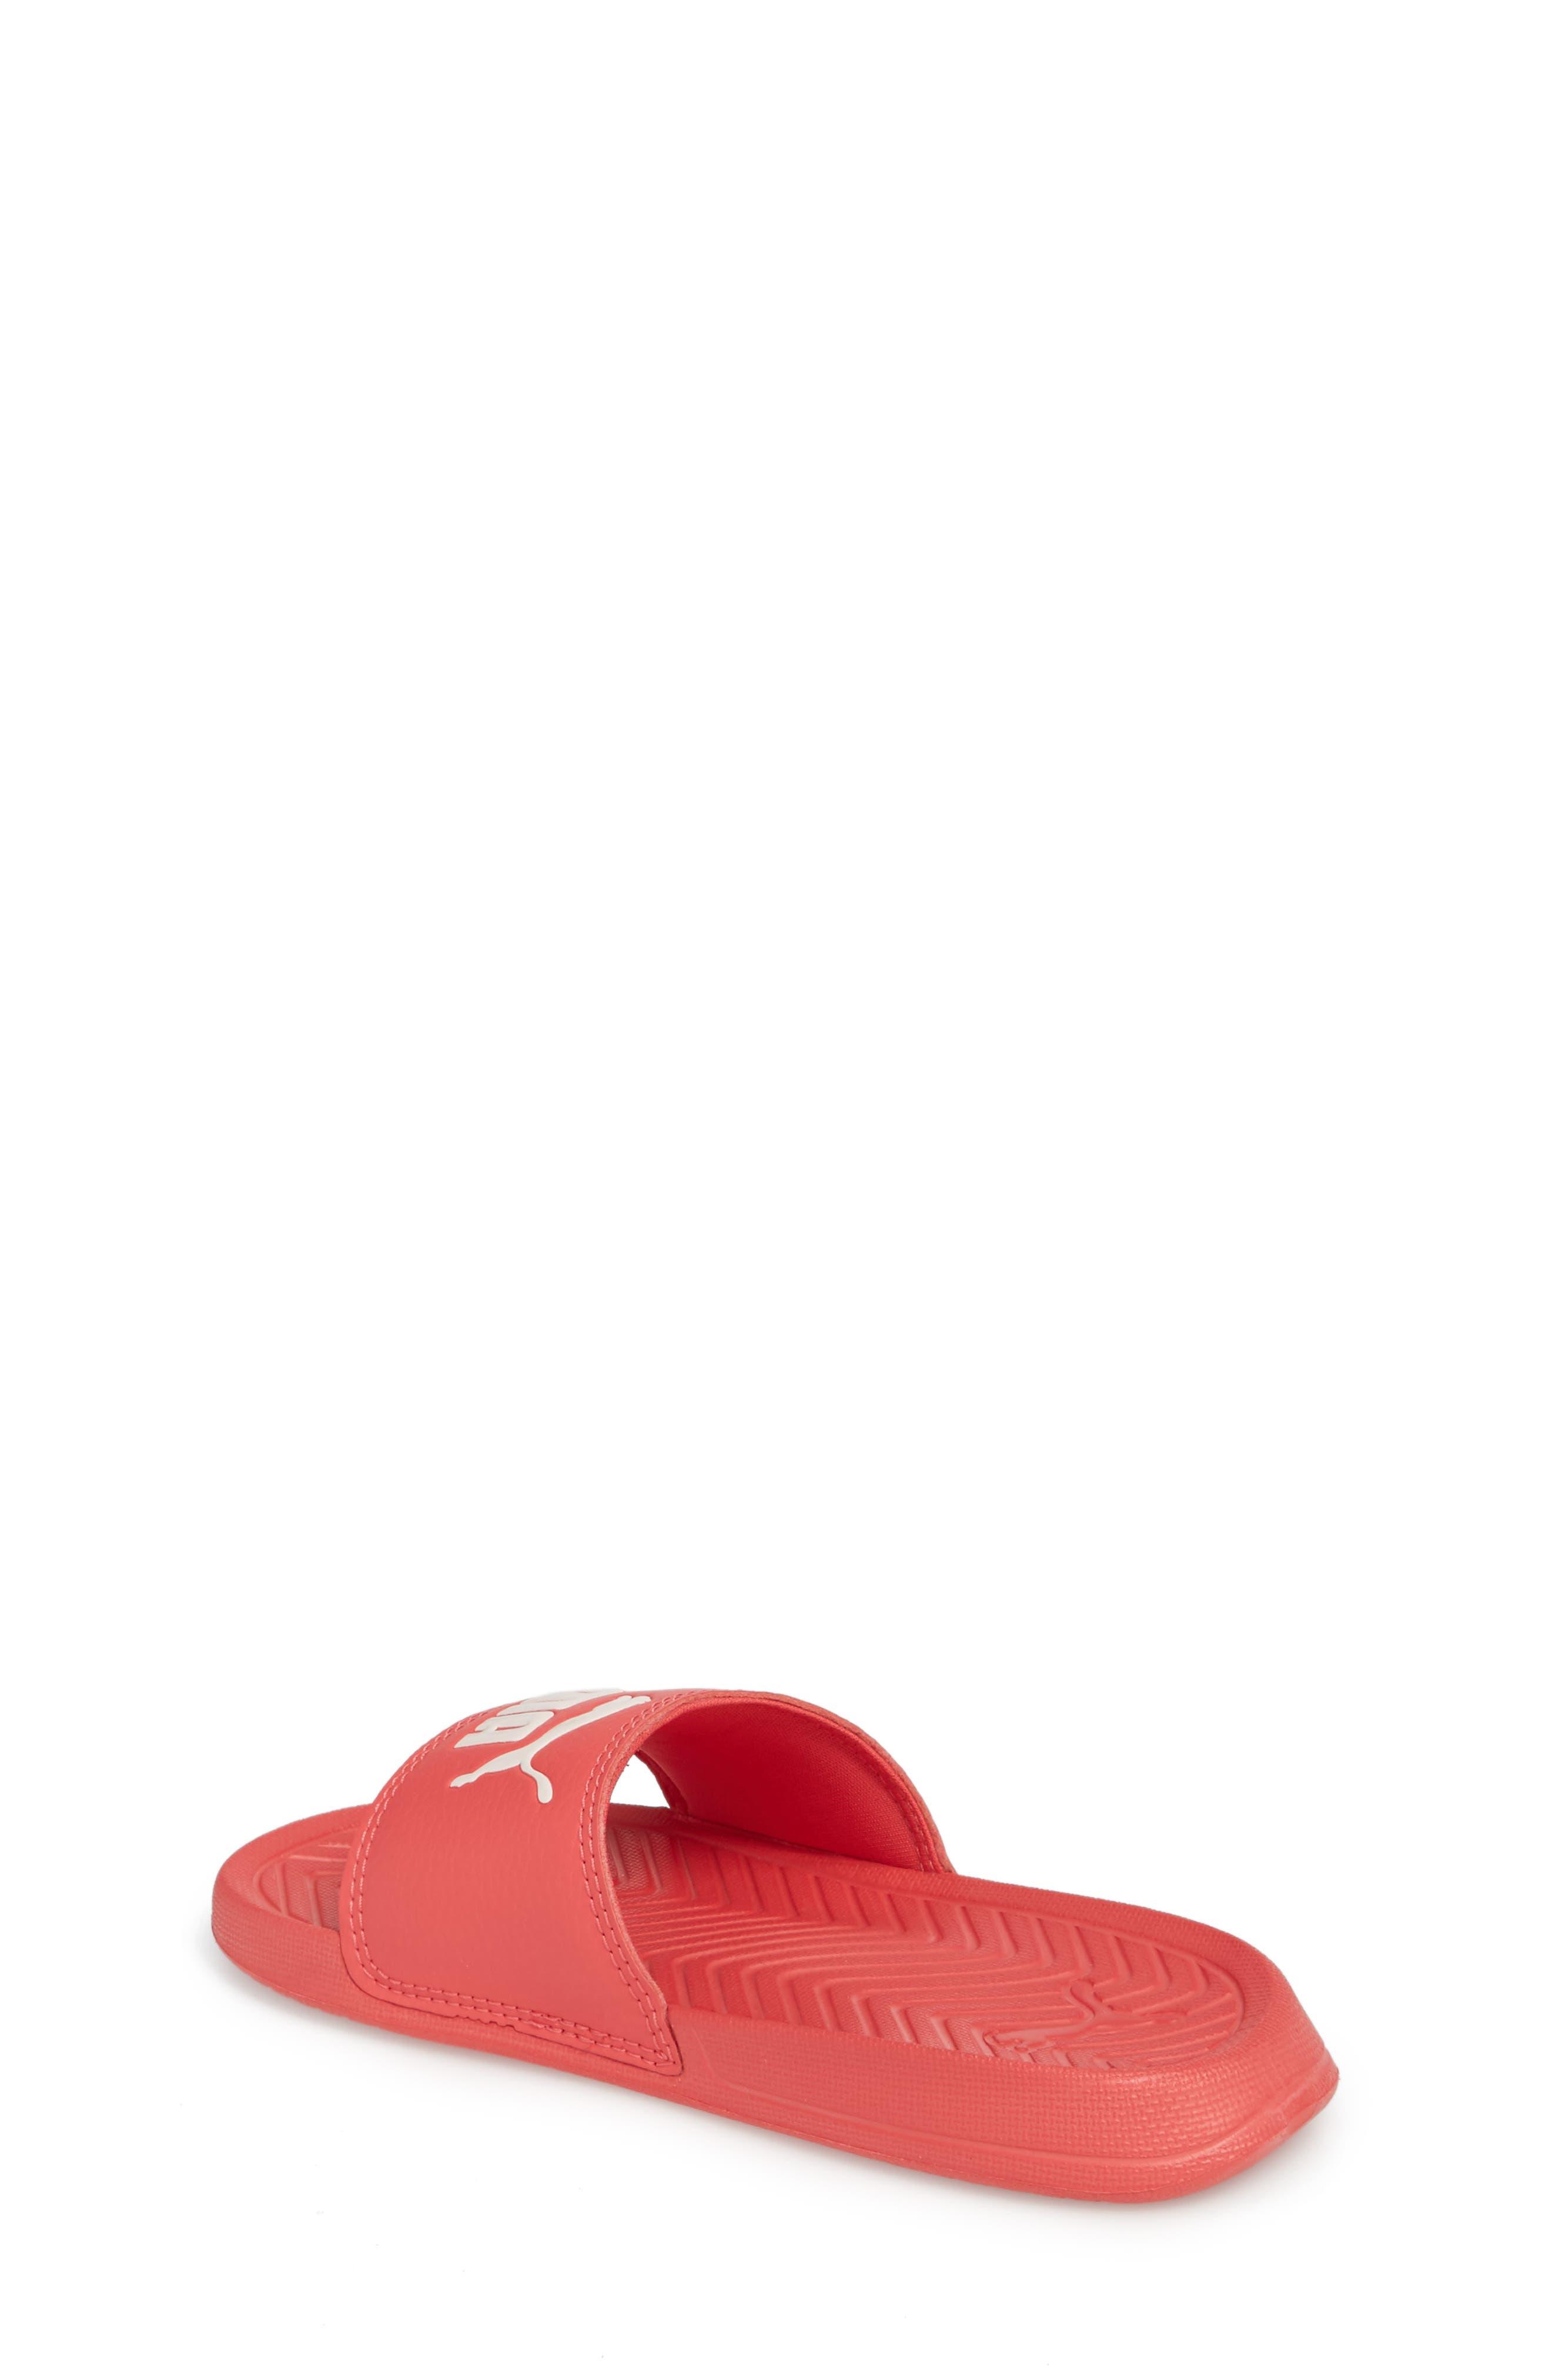 Popcat Slide Sandal,                             Alternate thumbnail 2, color,                             Paradise Pink/ Pearl